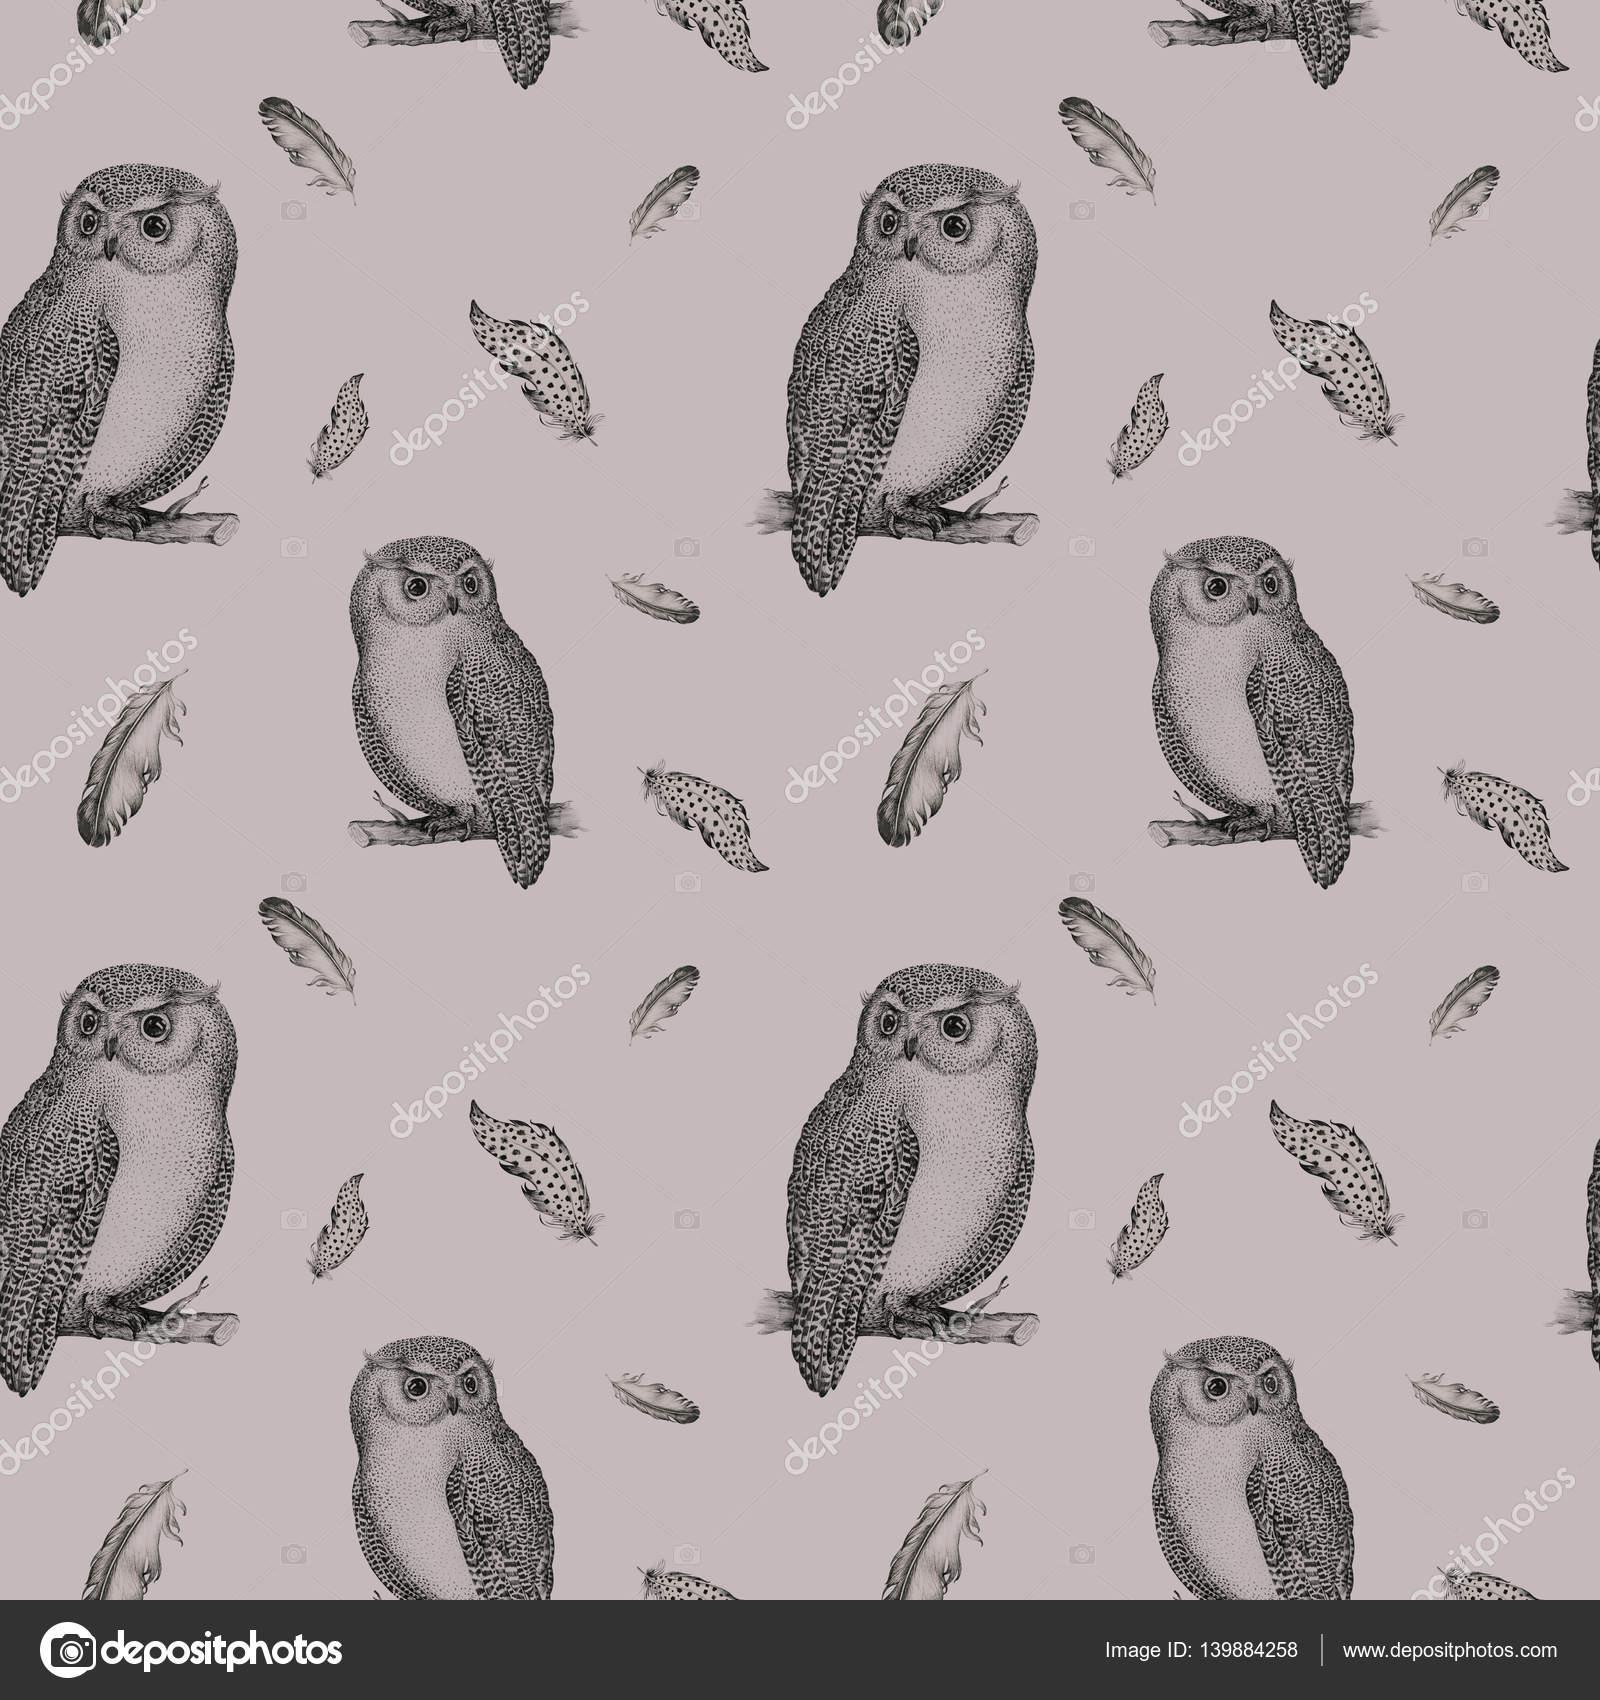 Mano dibujada patrón transparente blanco negro aislado buho pájaro ...